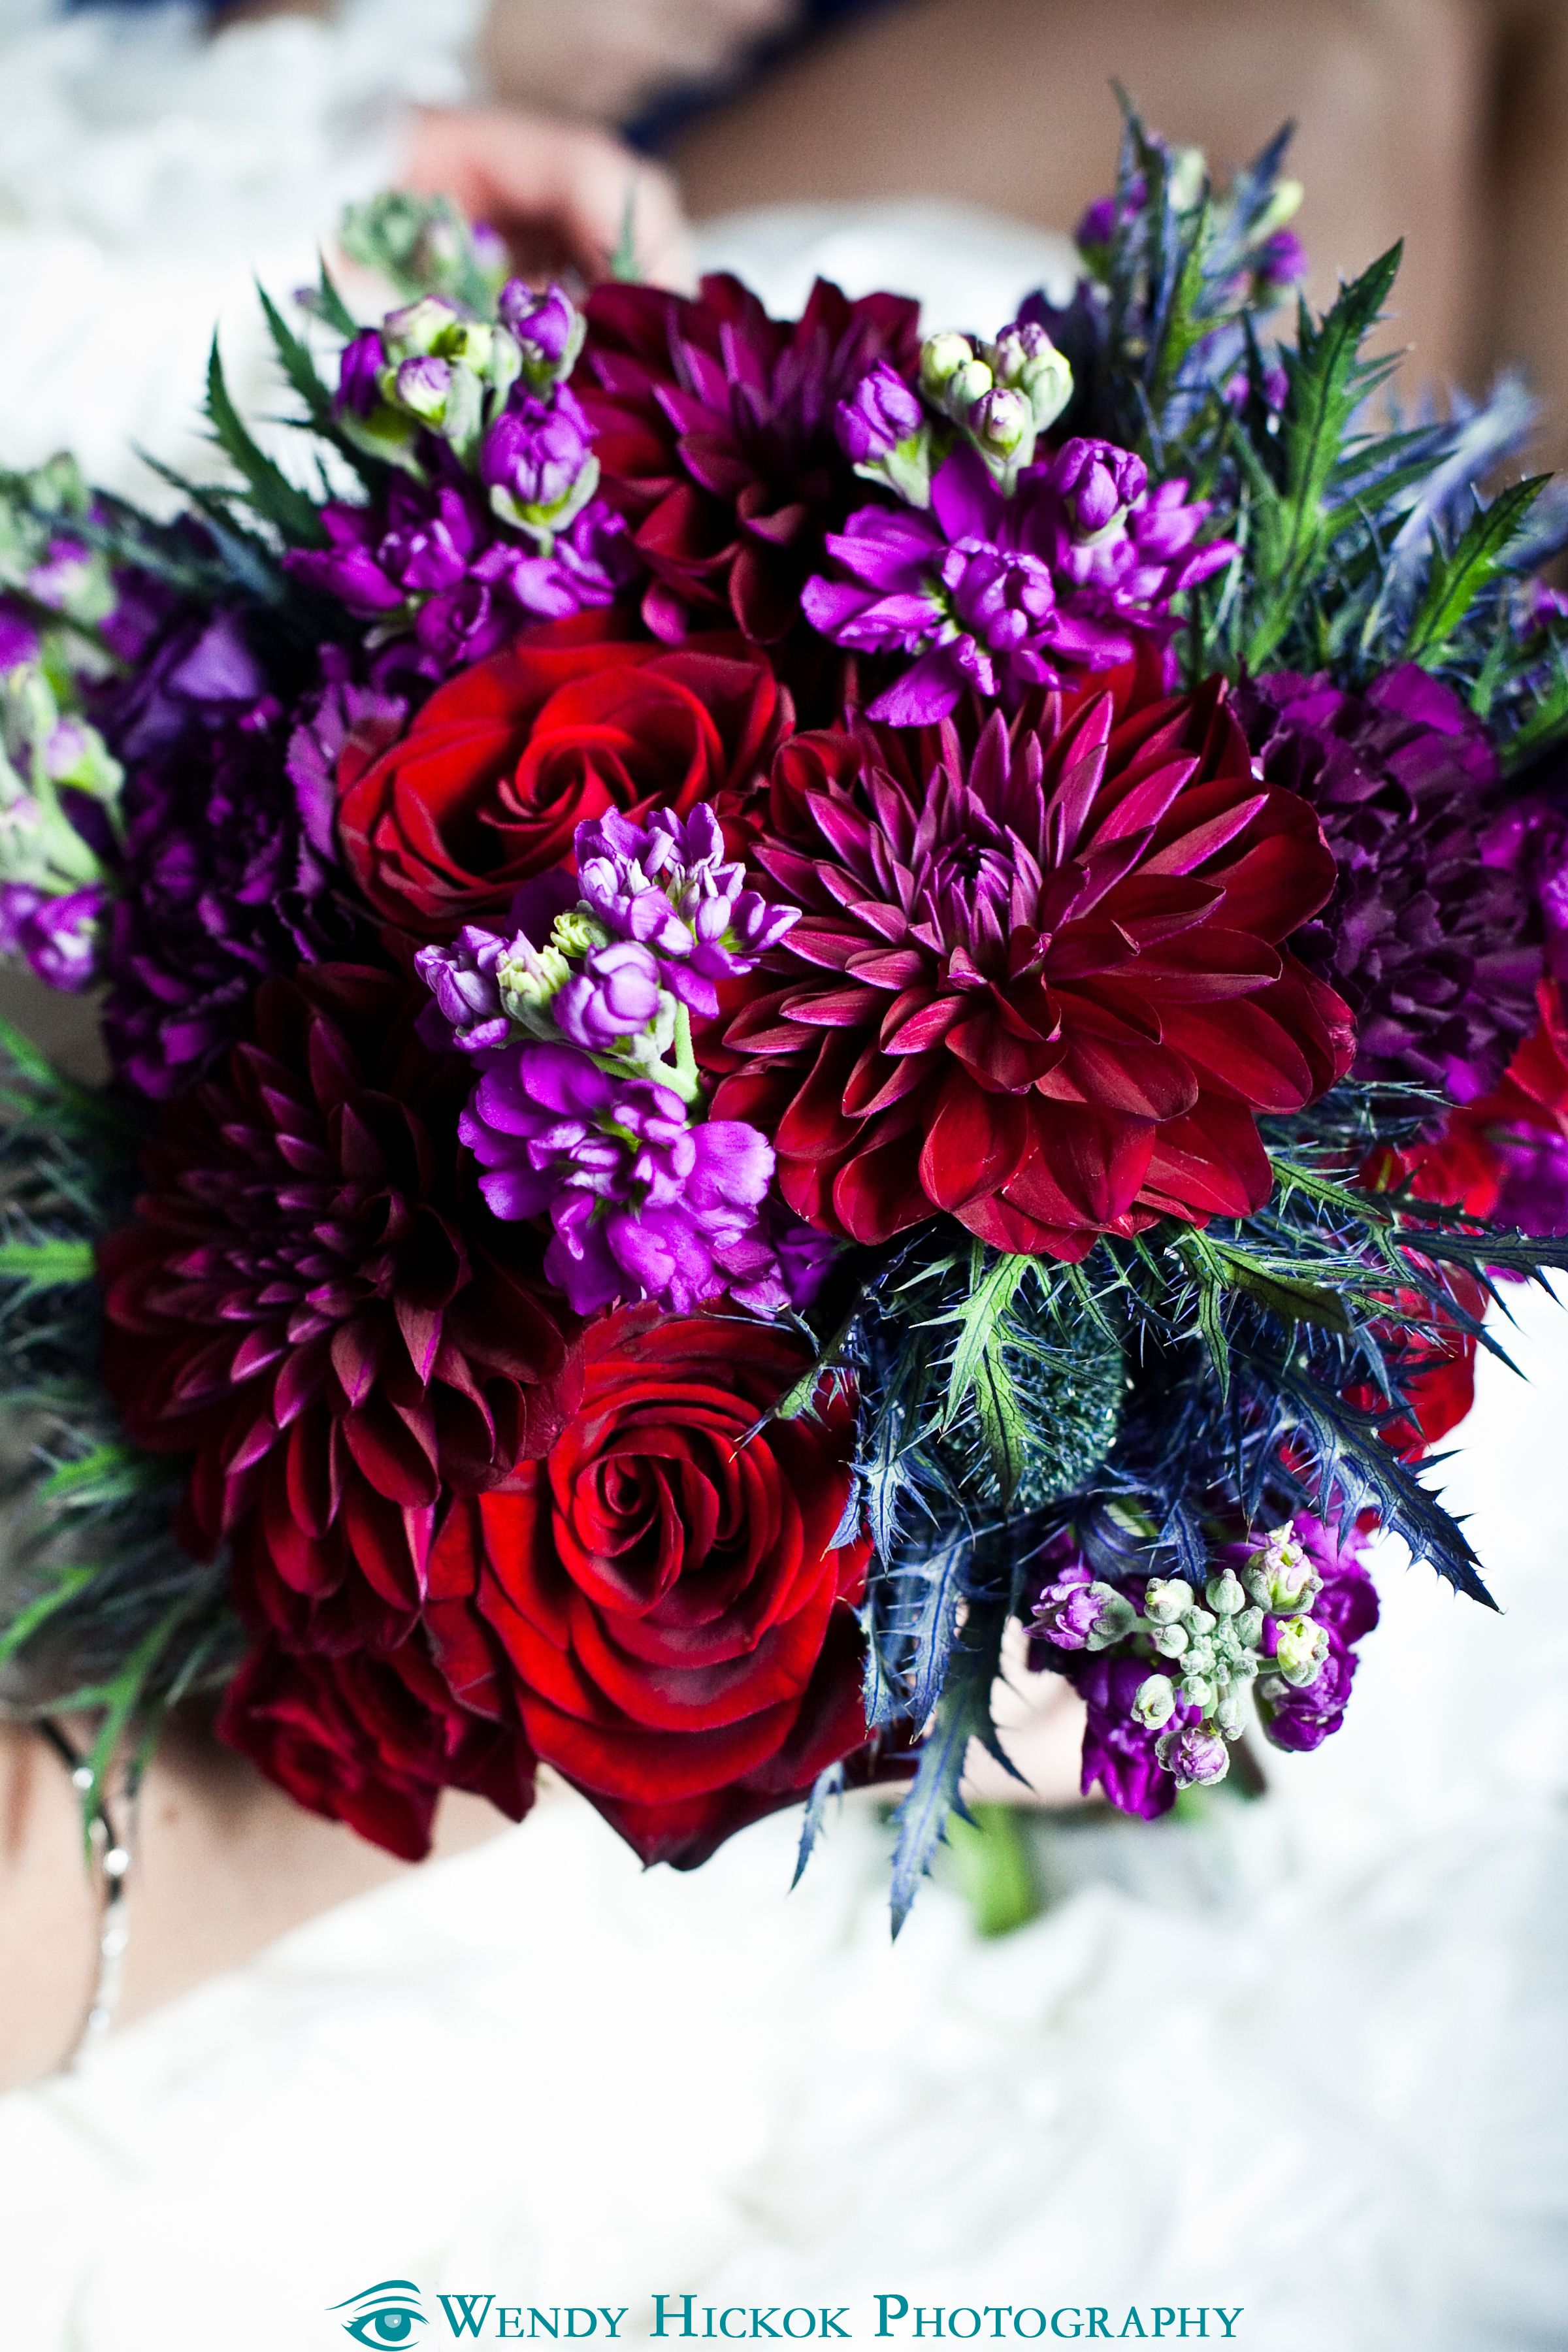 Jewel tone bouquet wedding floral center pieces in